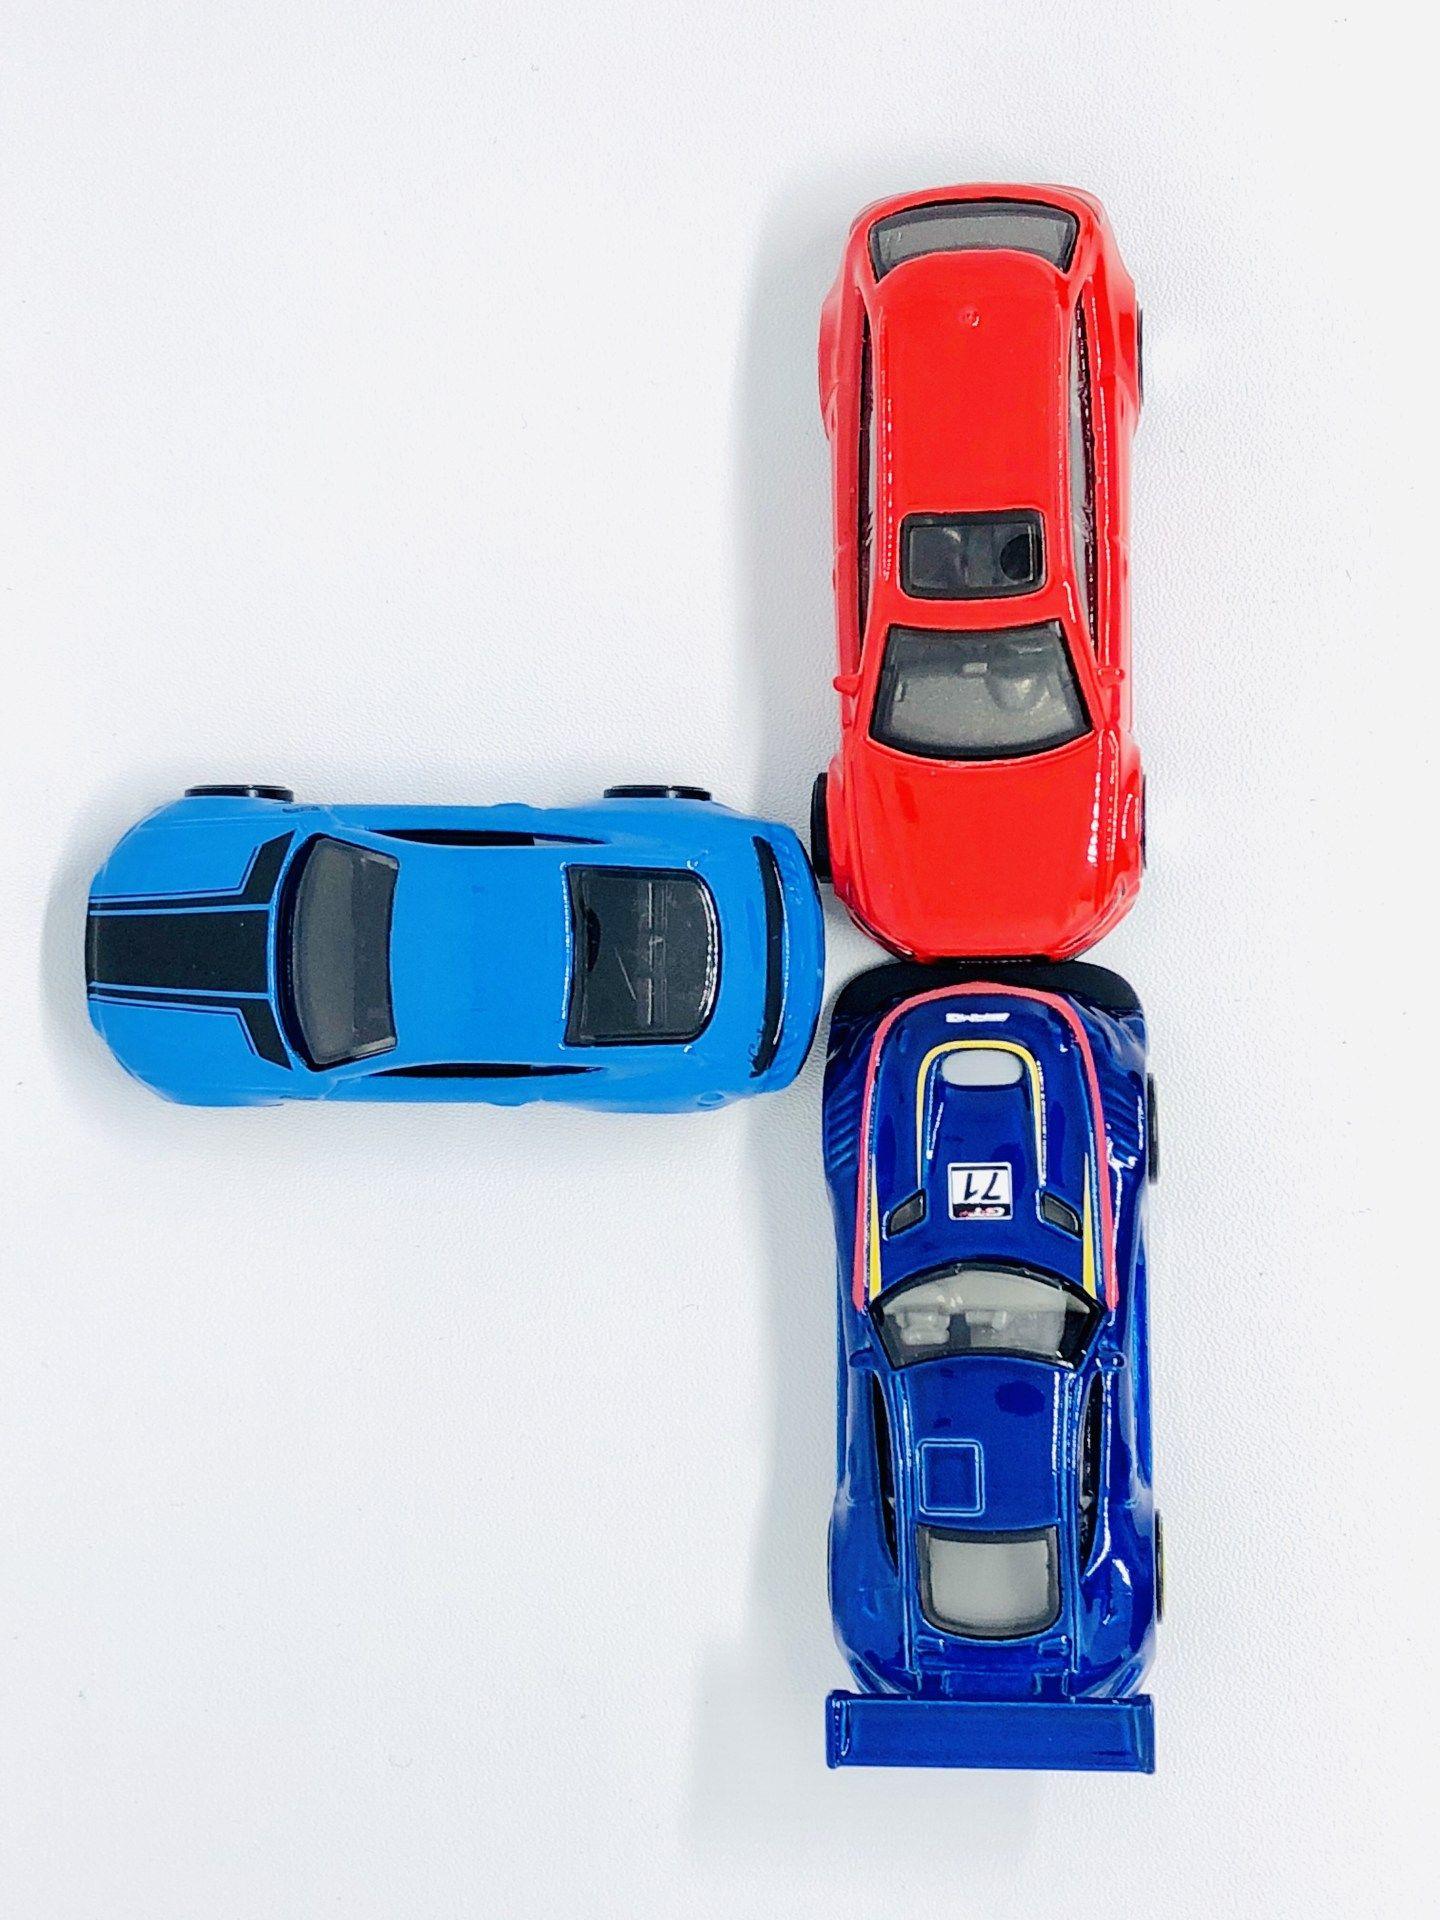 Wallpaper Mobil Sport Lamborghini Hitam Kelir Biru Trend Super Sport Cars Lamborghini Cars New Sports Cars